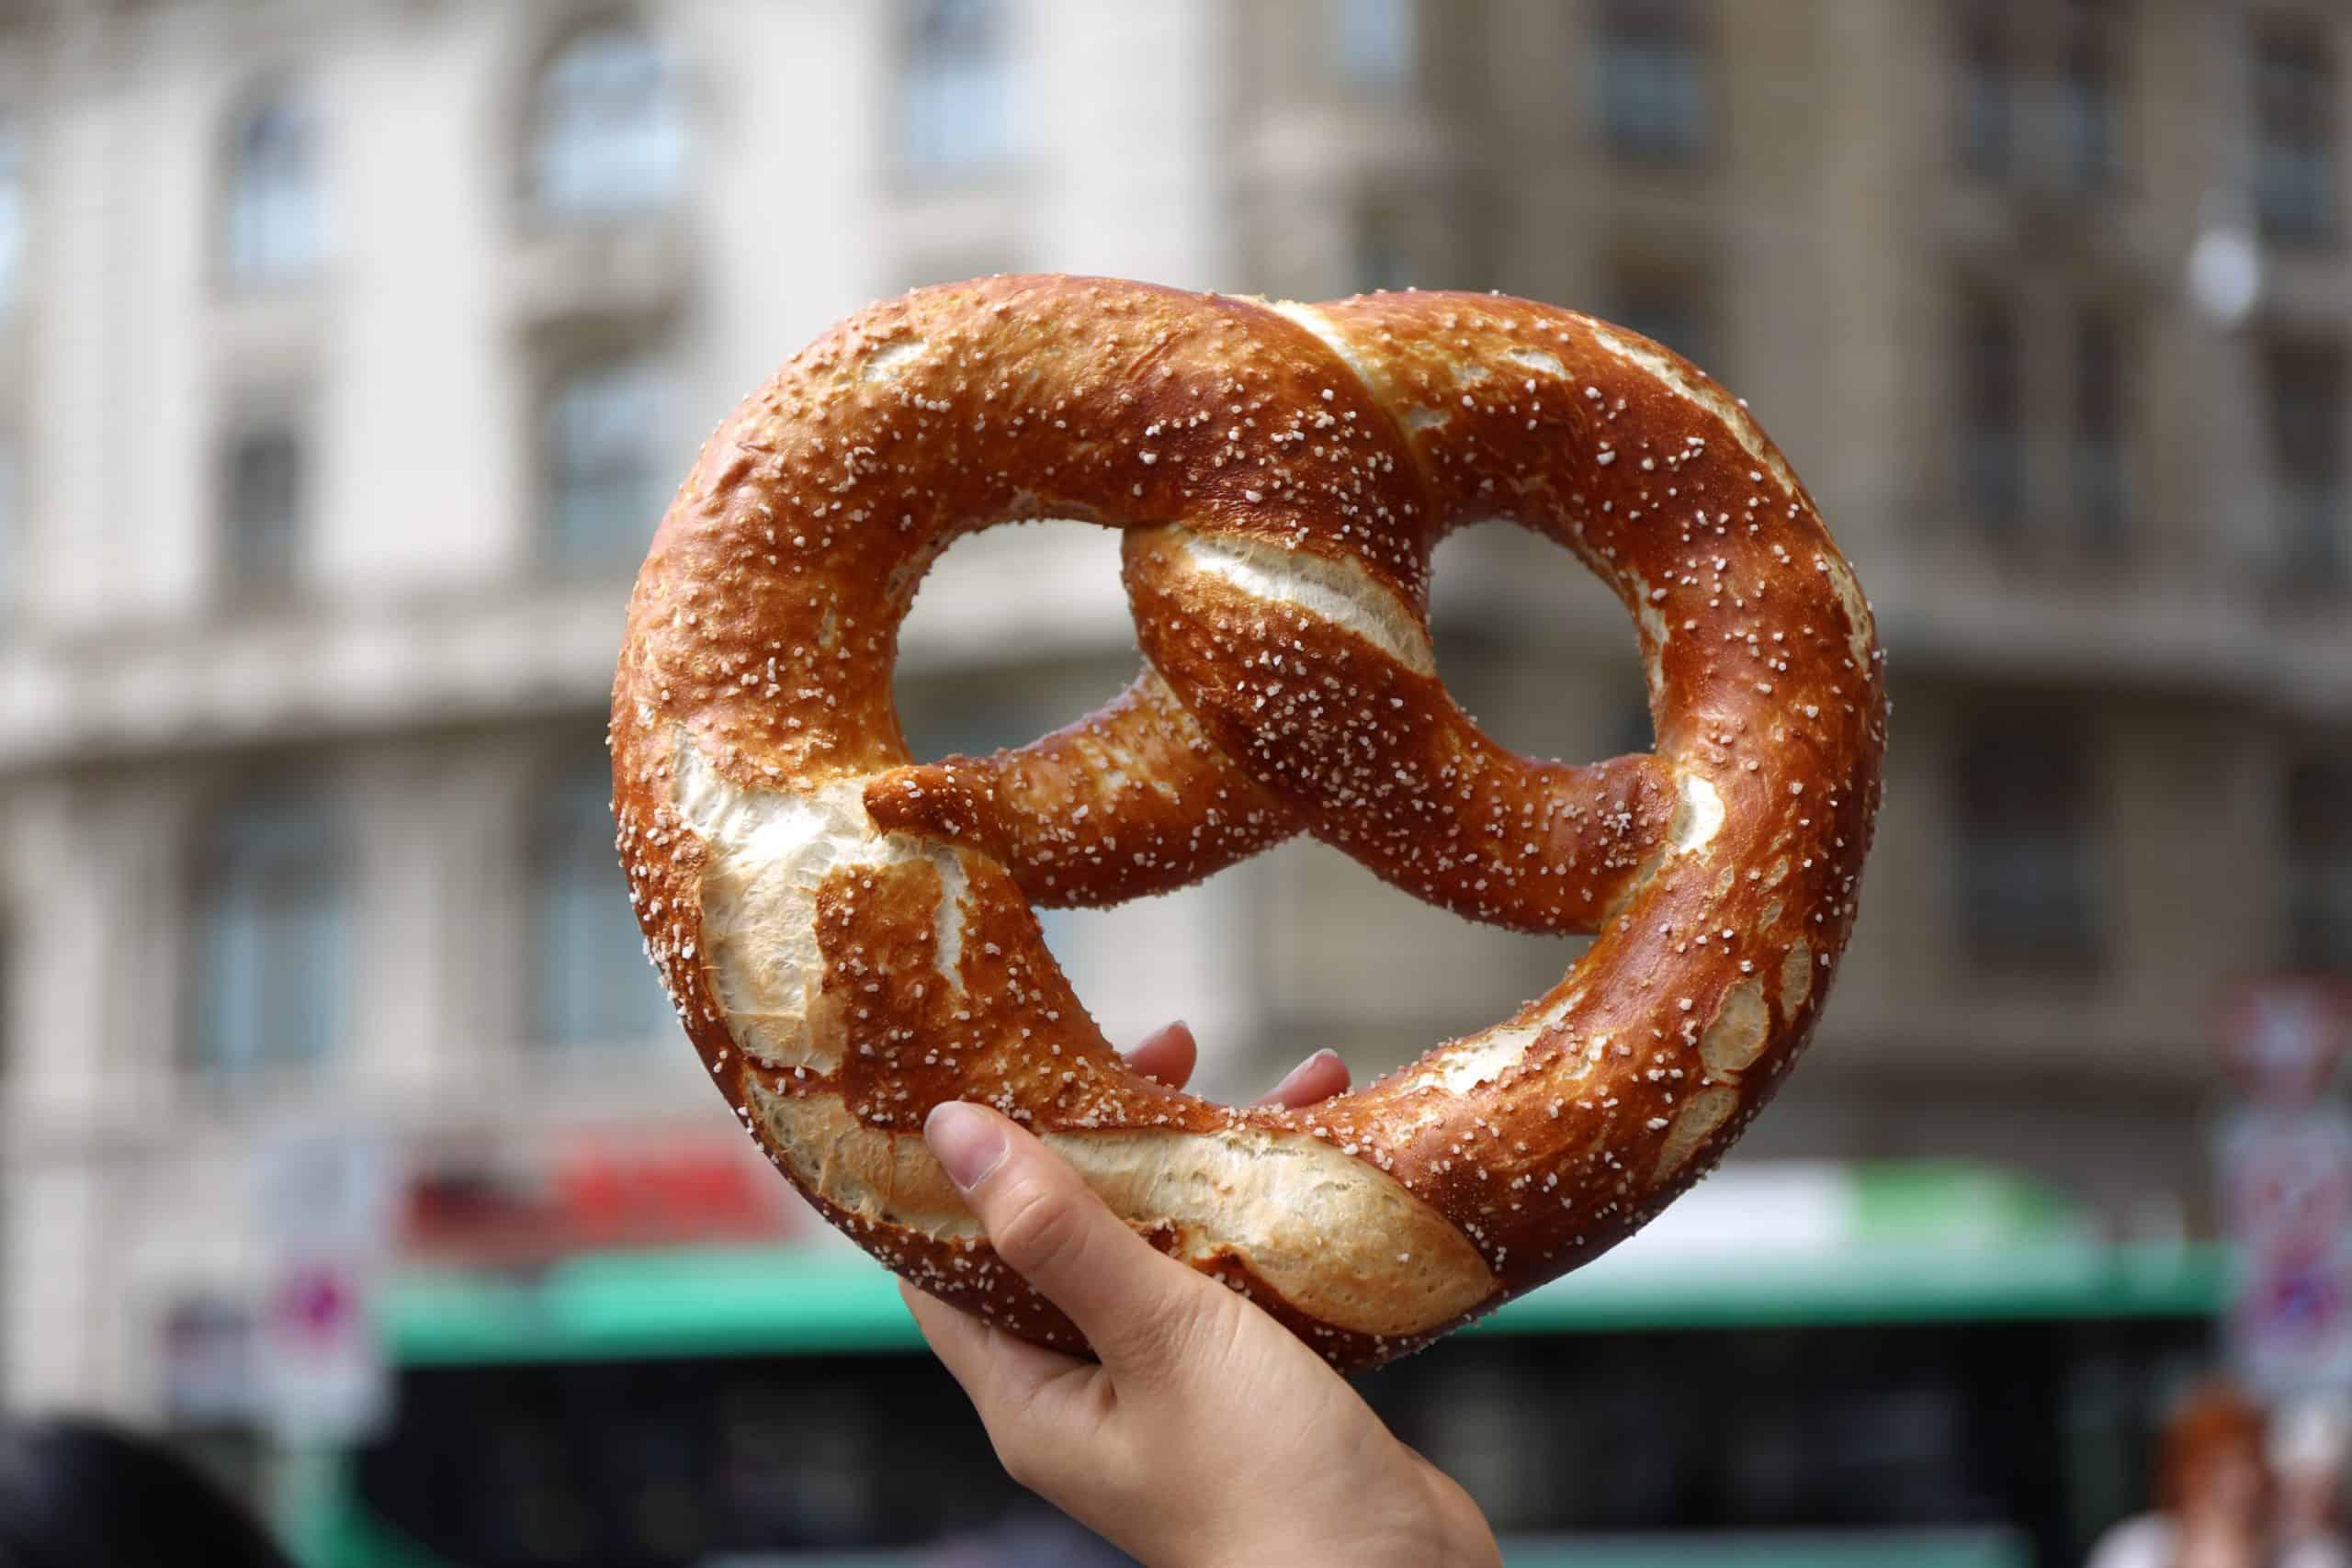 National Pretzel Day Deals - hand holding up a soft pretzel against an urban setting